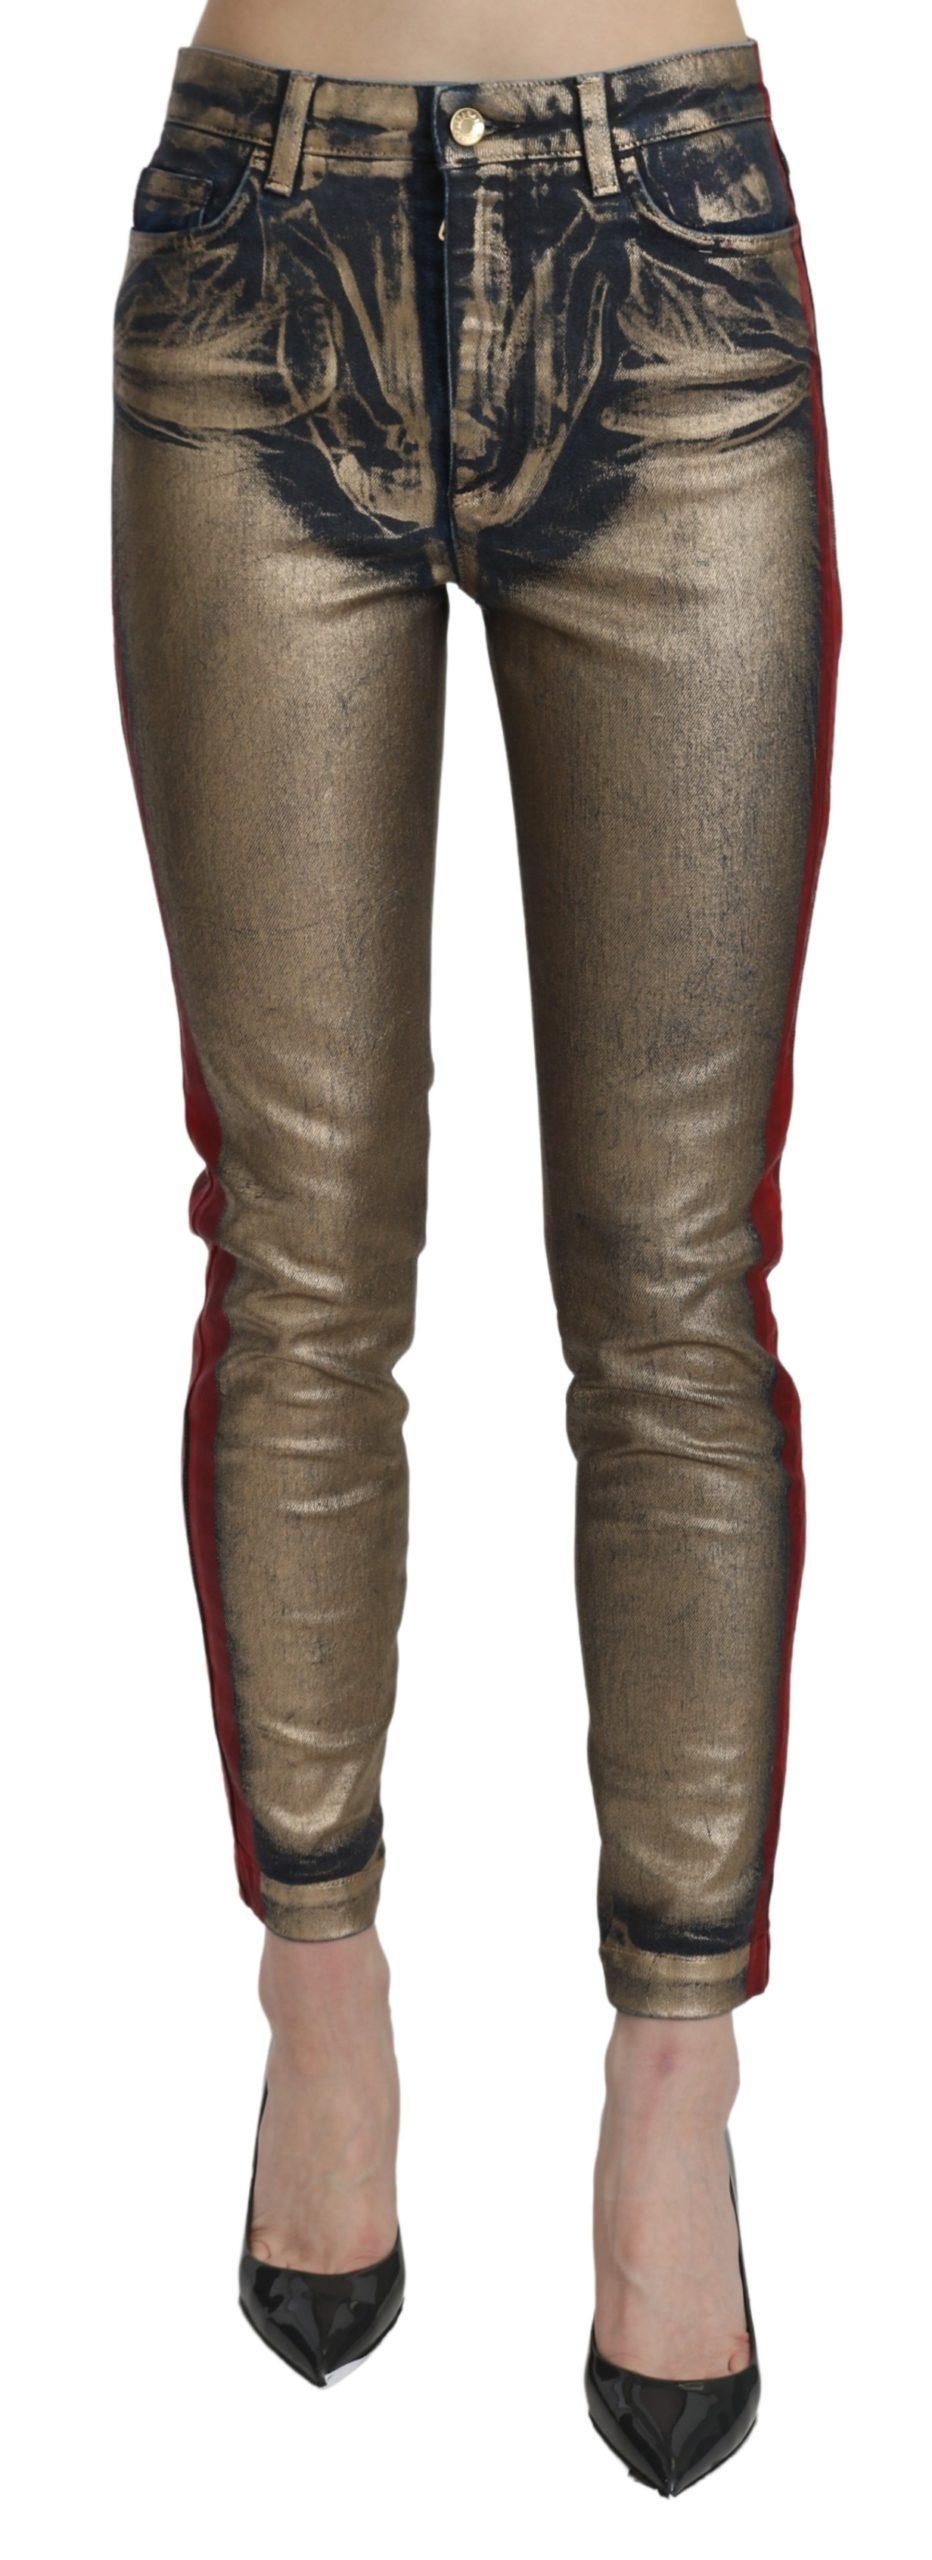 Dolce & Gabbana Women's High Waist Skinny Cotton Trouser Gold PAN71068 - IT40 S